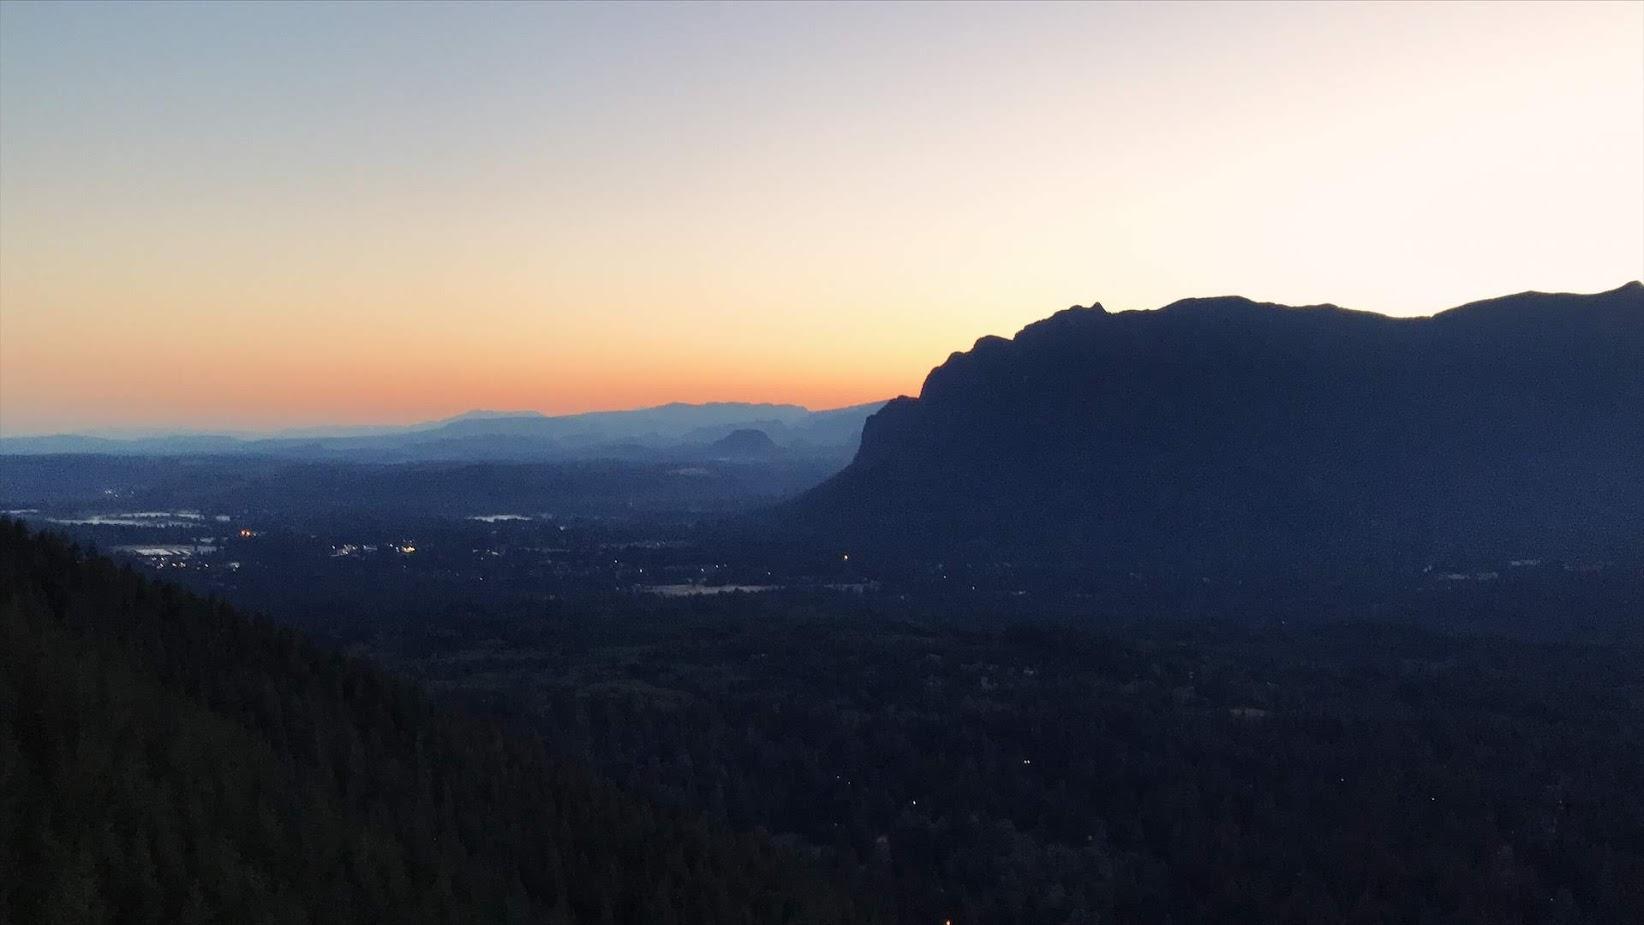 Sunrises are unforgettable!